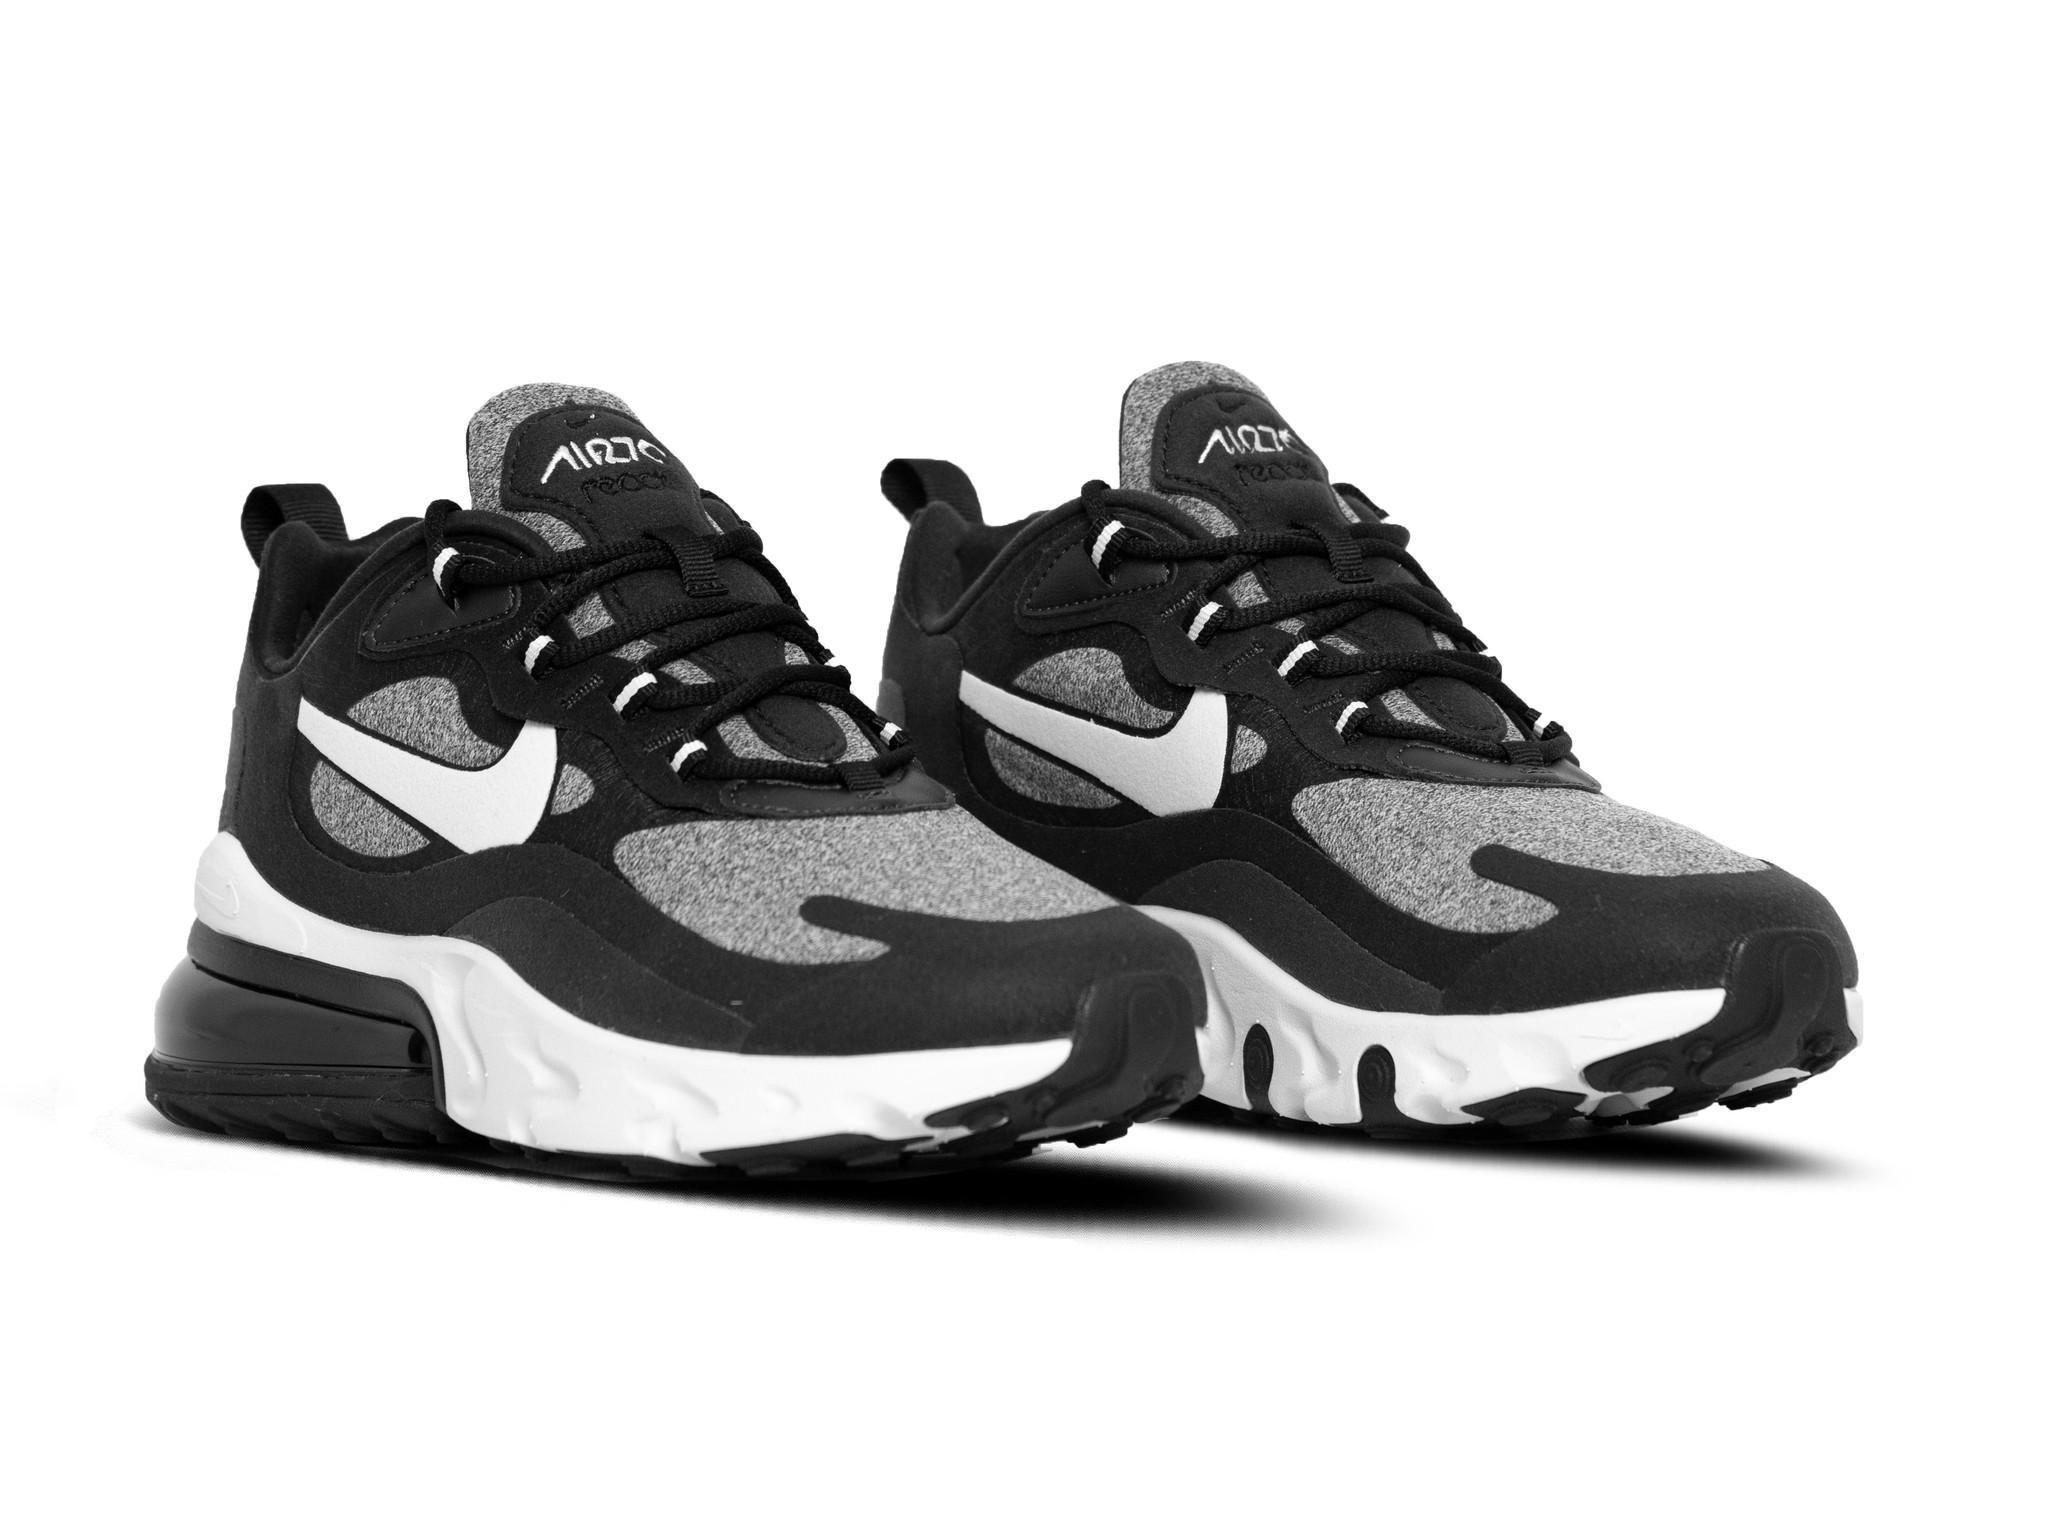 Nike Air Max 270 React Black Vast Grey AO4971 001